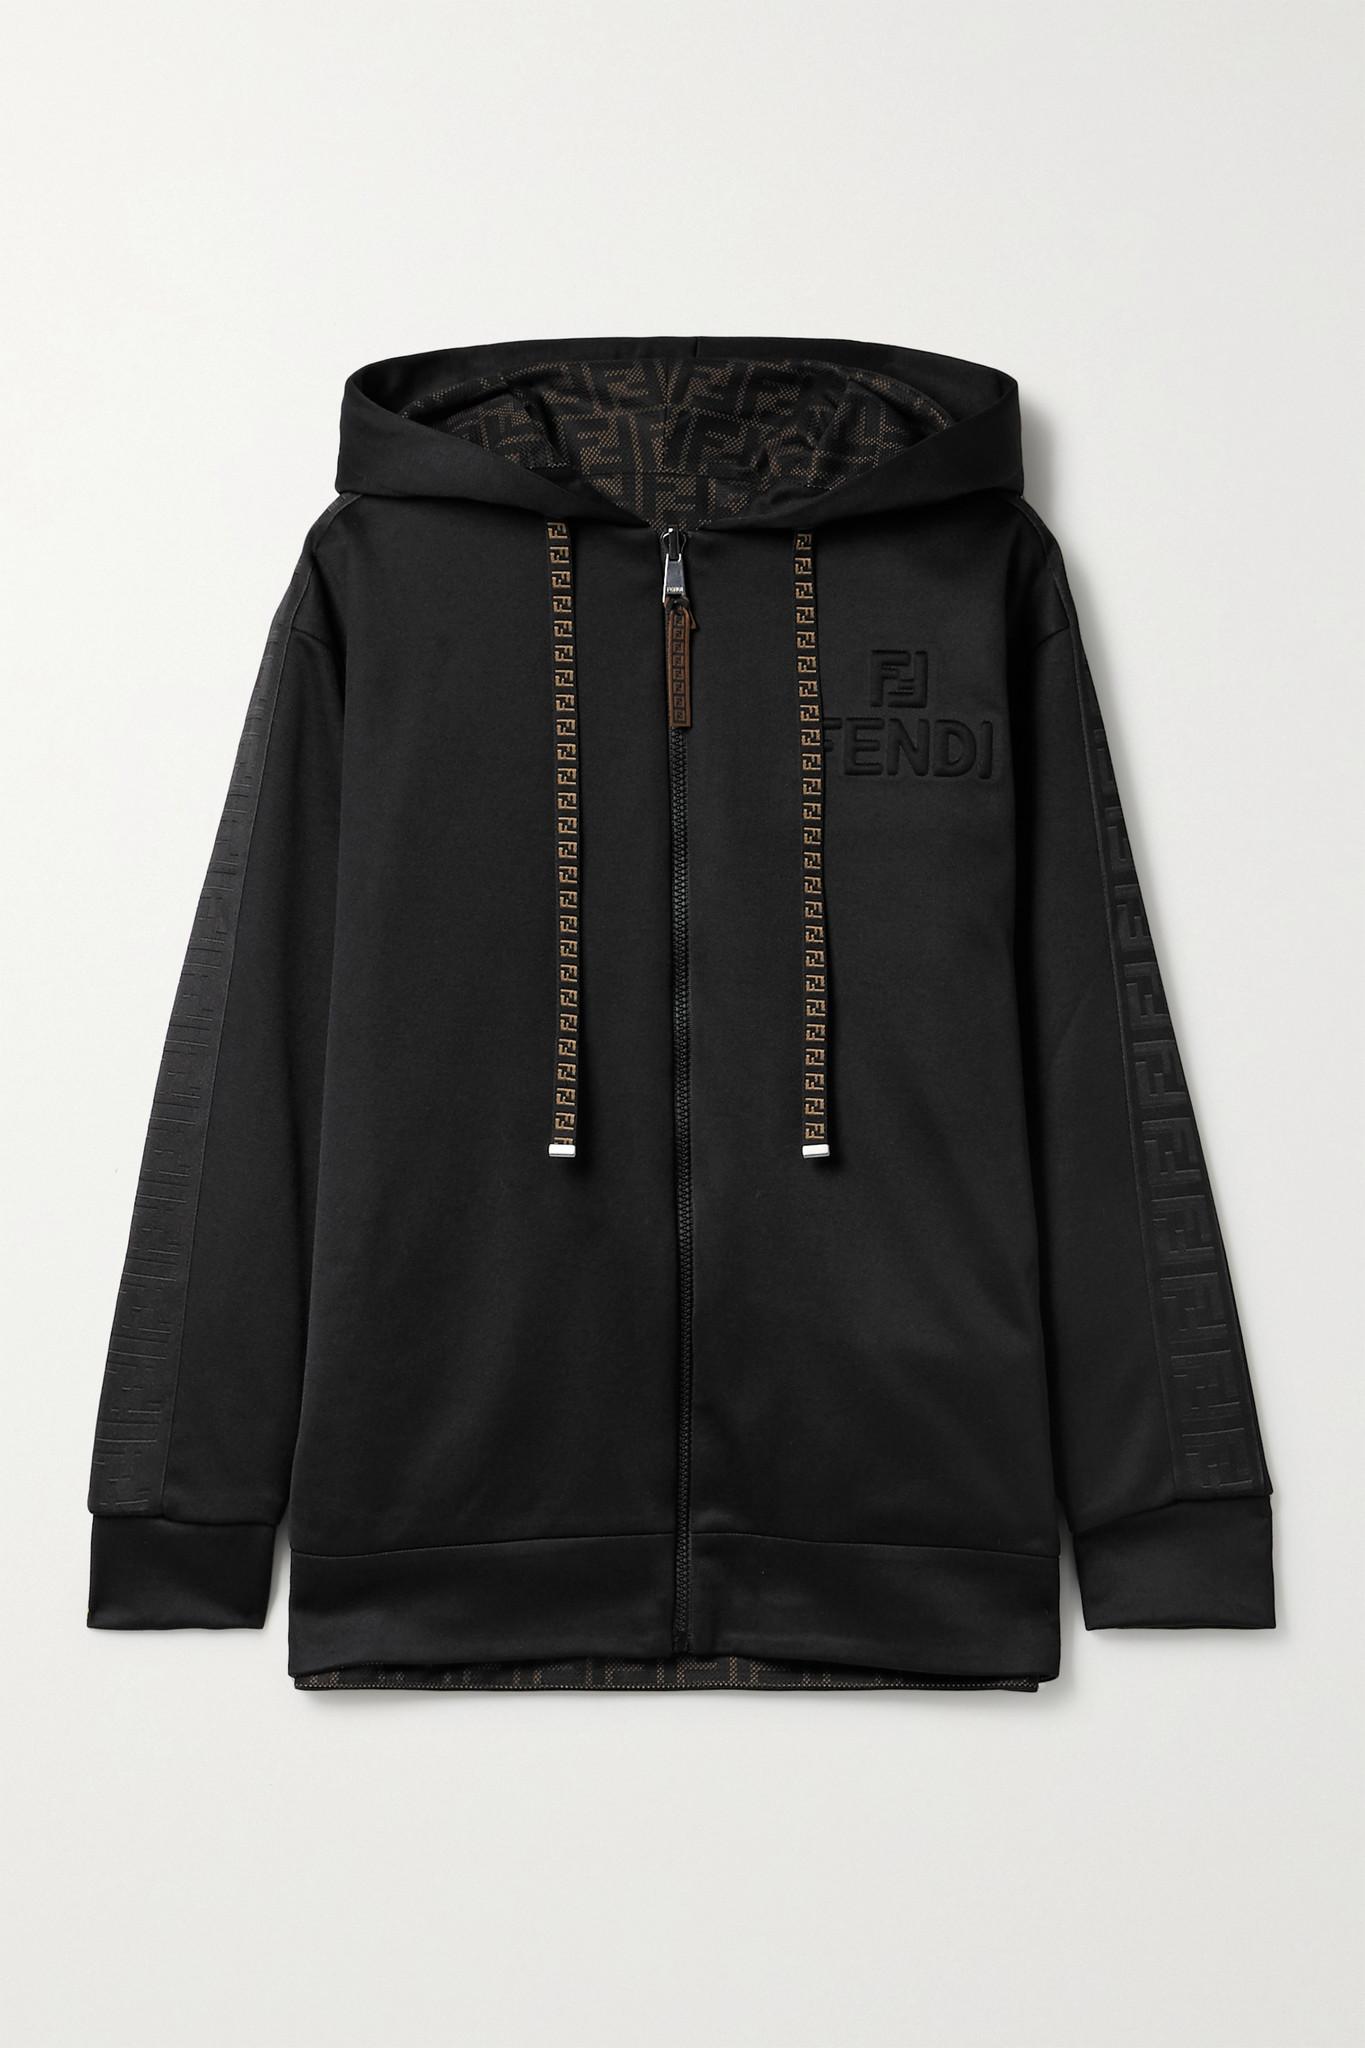 FENDI - 正反两穿科技平纹布印花网布帽衫 - 黑色 - x large